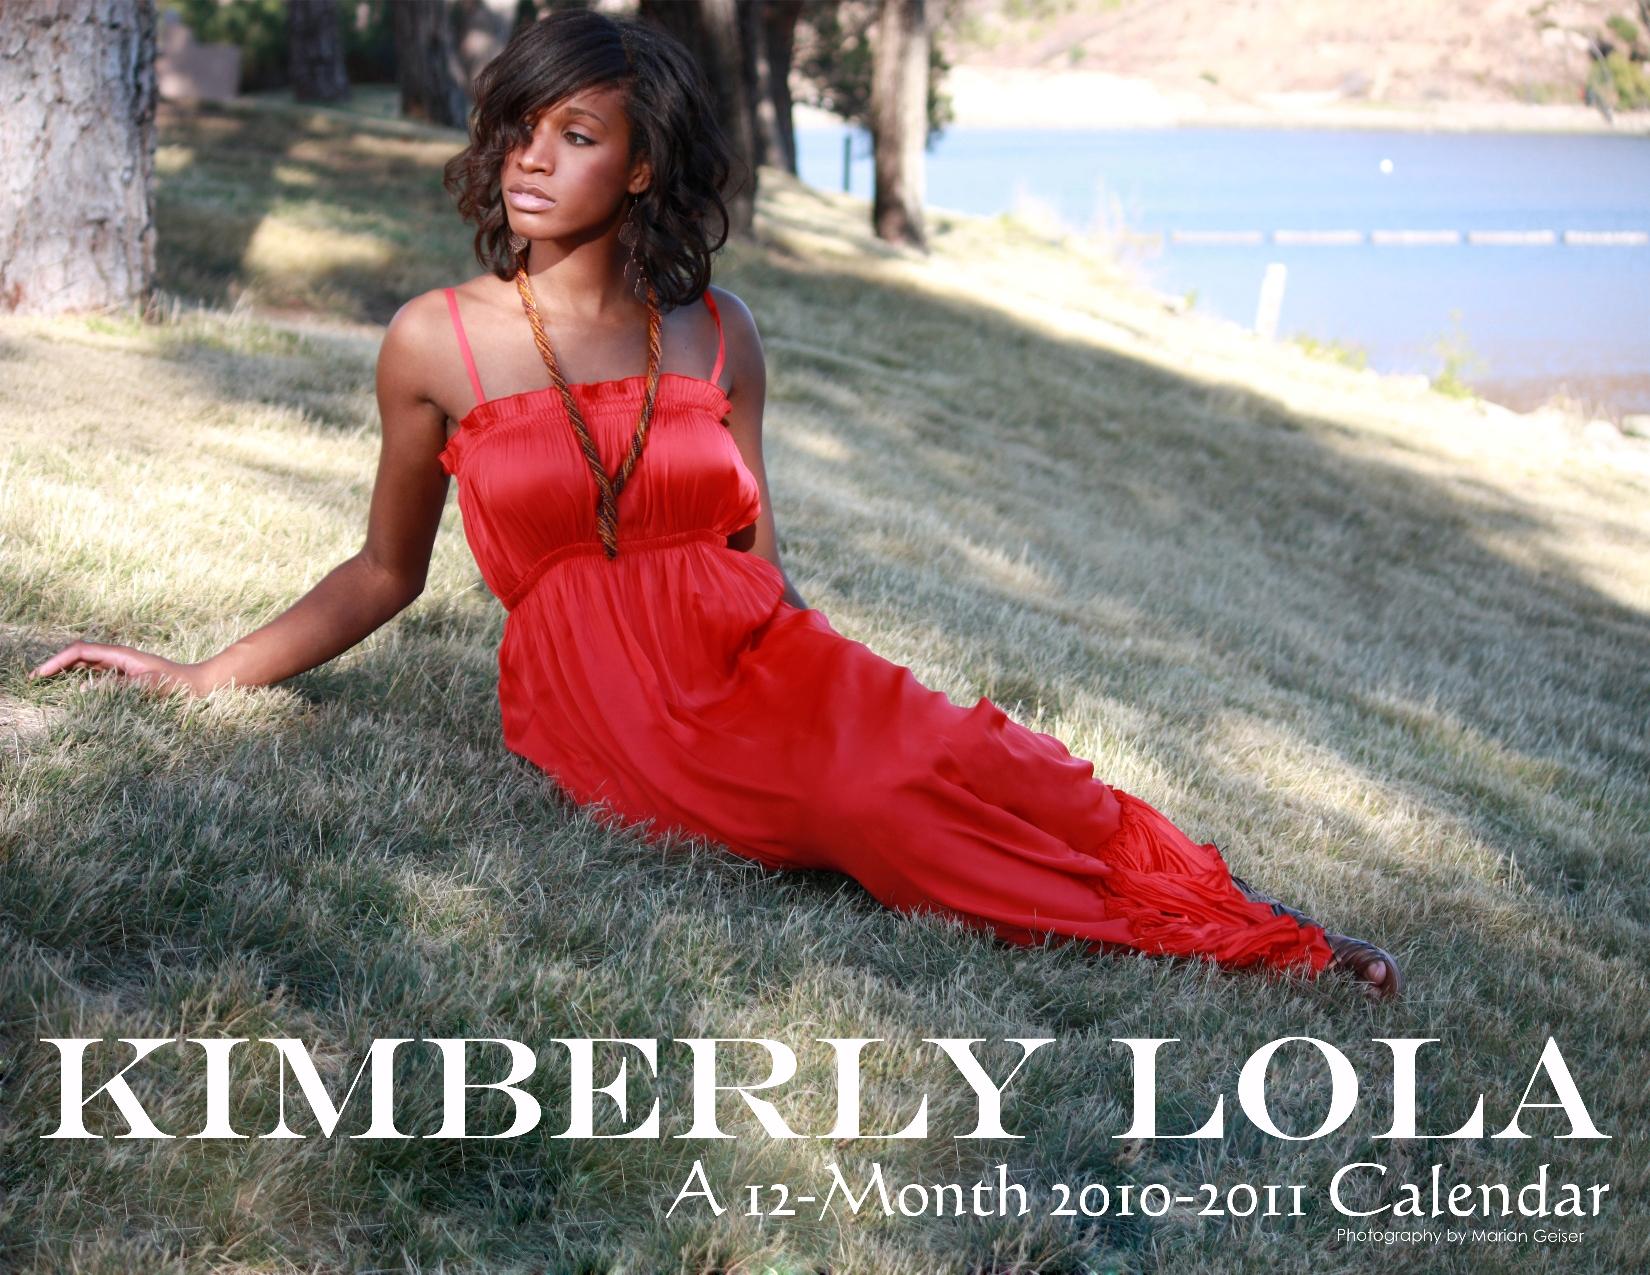 Think Like A Model Kimberly Lola 2010 Calendar Cover